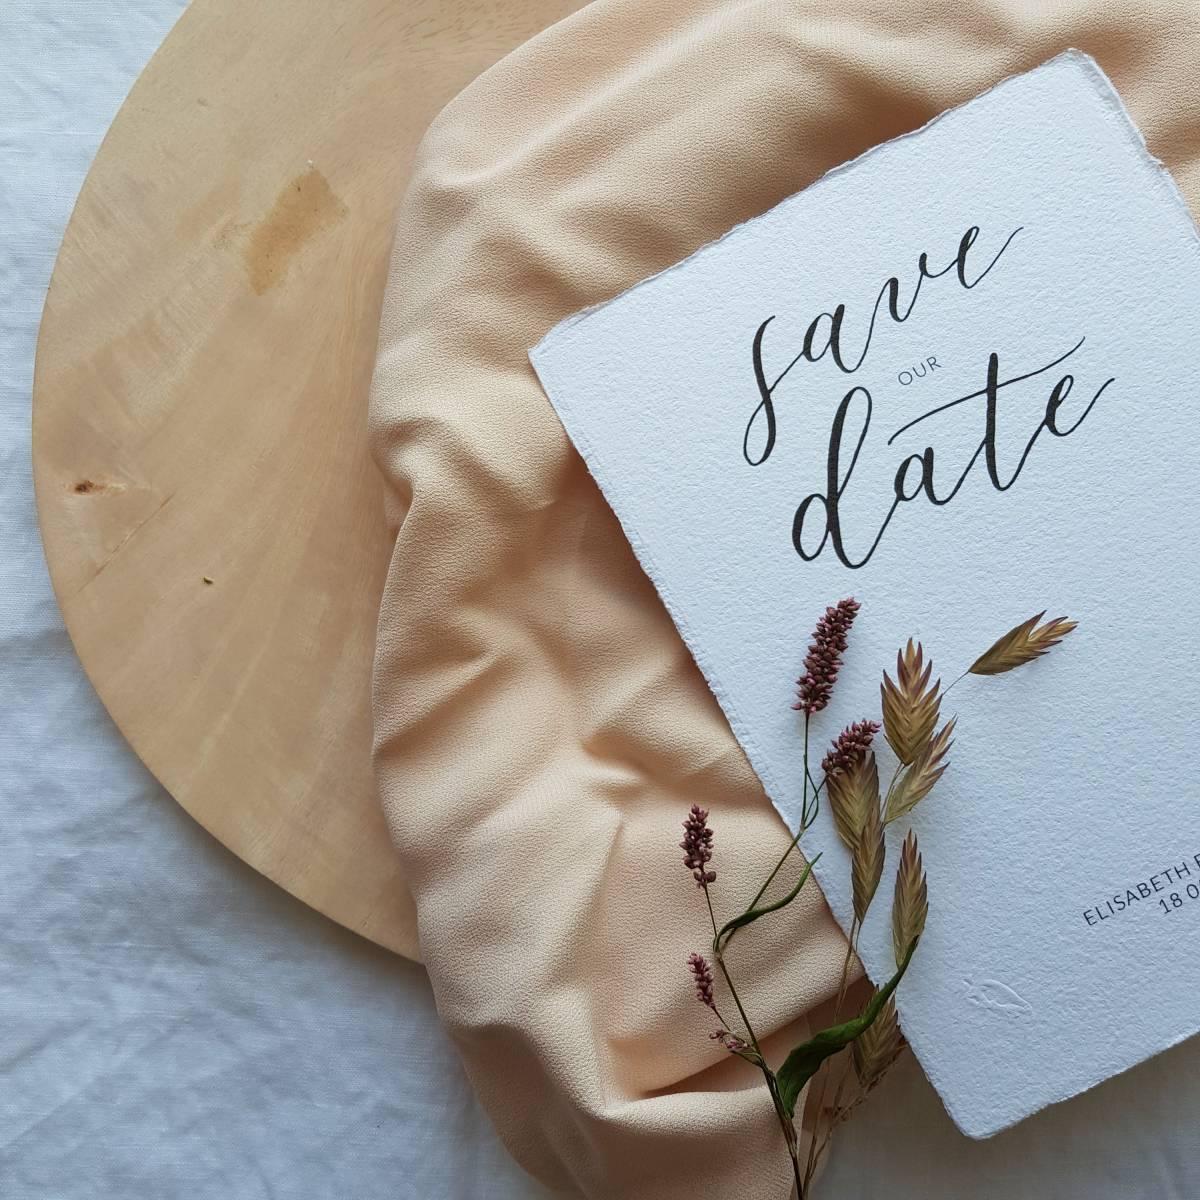 Touch of Gold - Trouwuitnodiging - Huwelijksuitnodiging - Kalligrafie - House of Weddings - 8 (1)